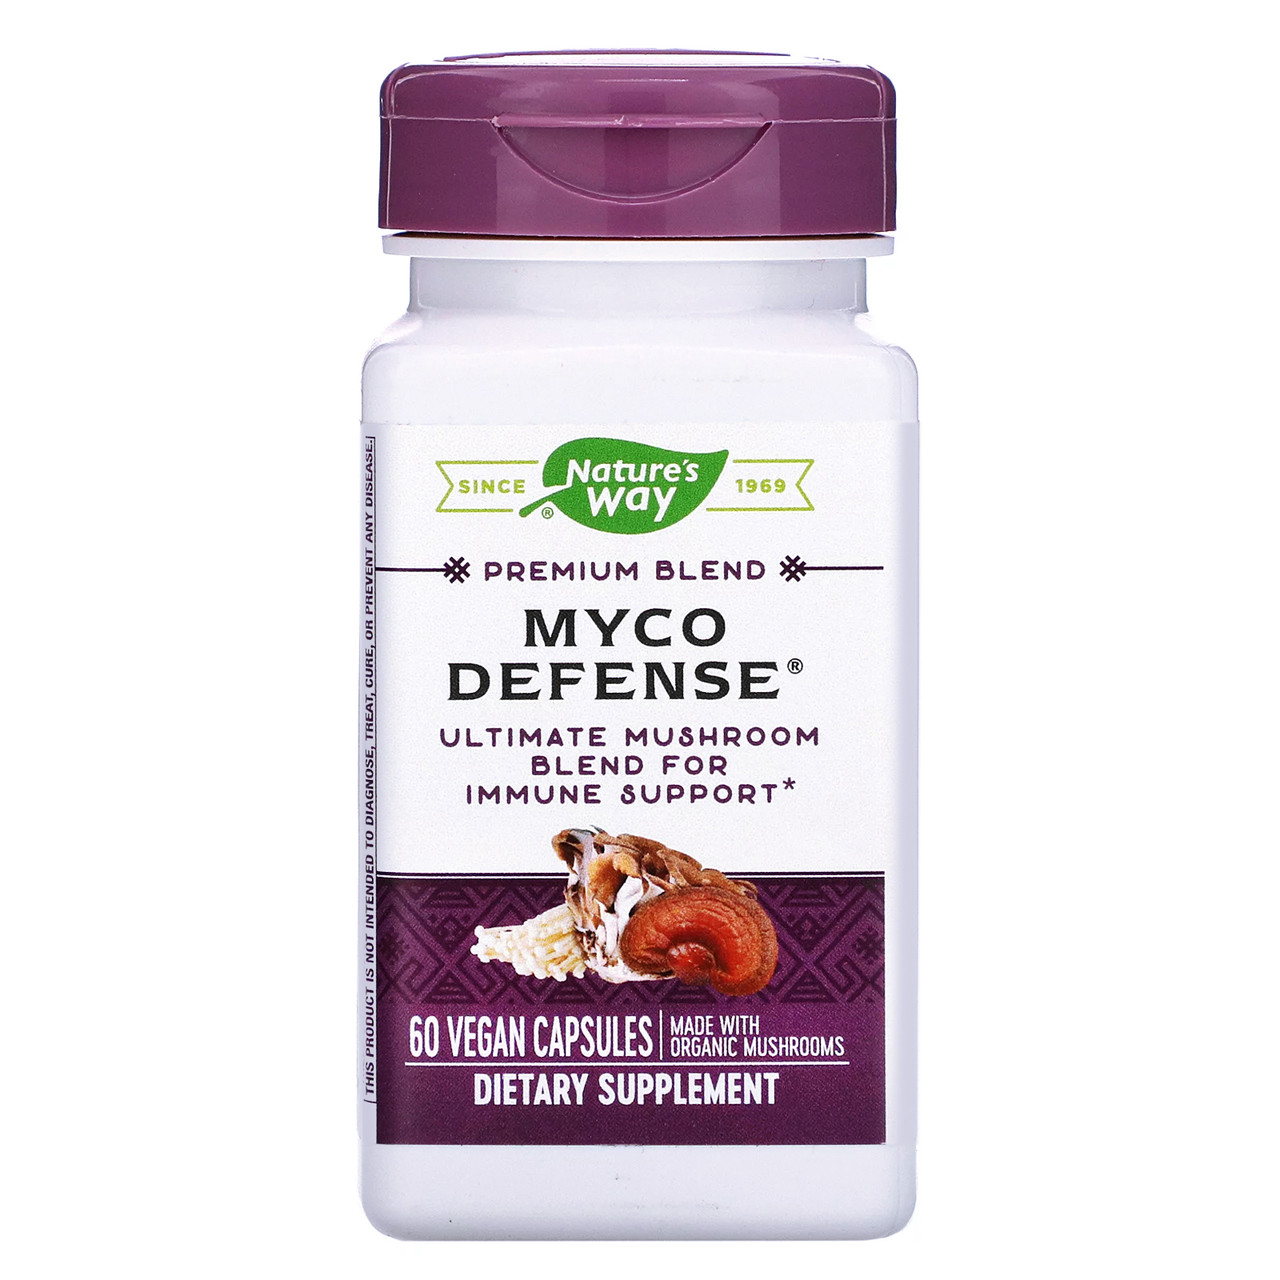 Витамин C с травами, для иммунитета, Natures Way, Myco Defense, 60 капсул